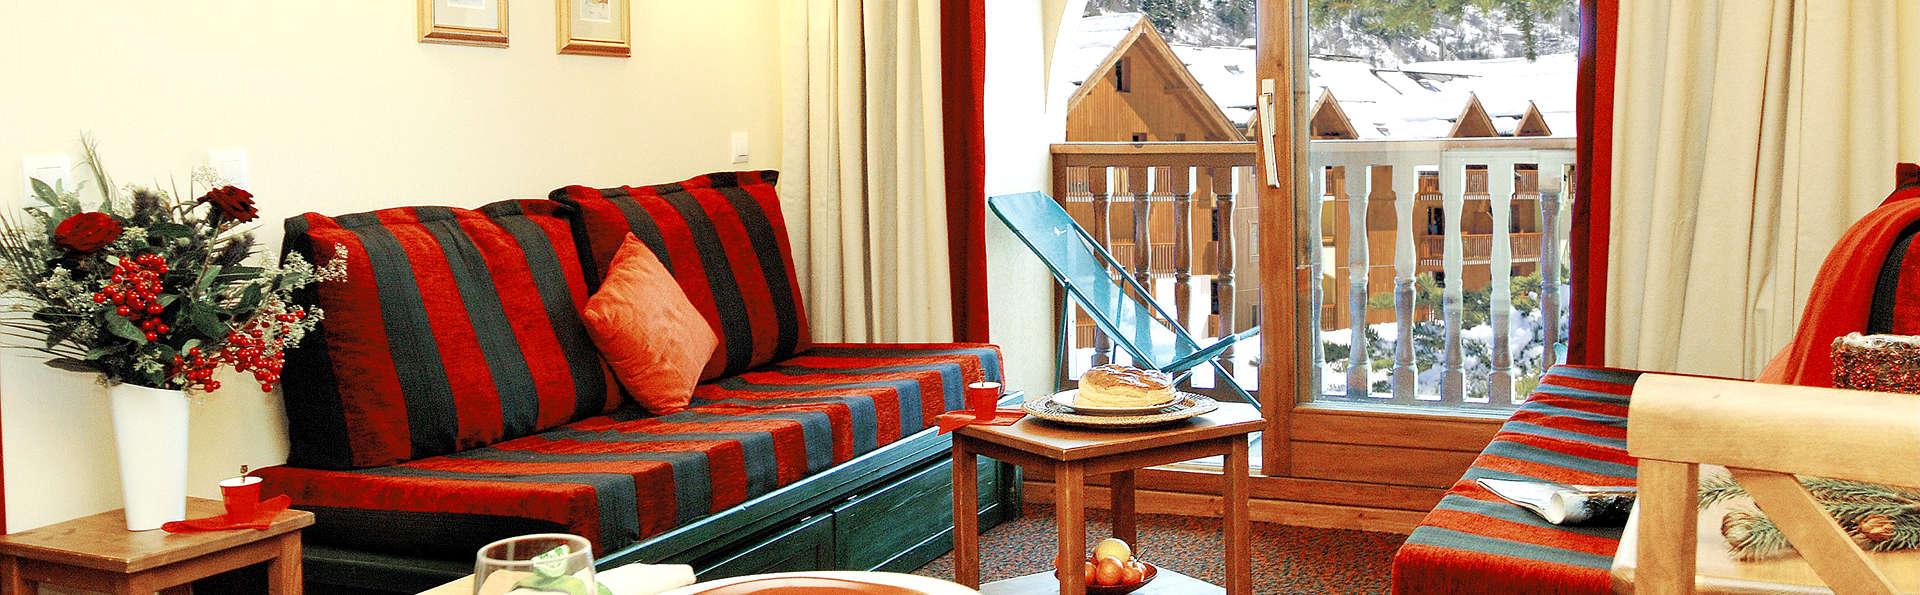 Pierre et Vacances Résidence L'Alpaga - Edit_Apartment2.jpg